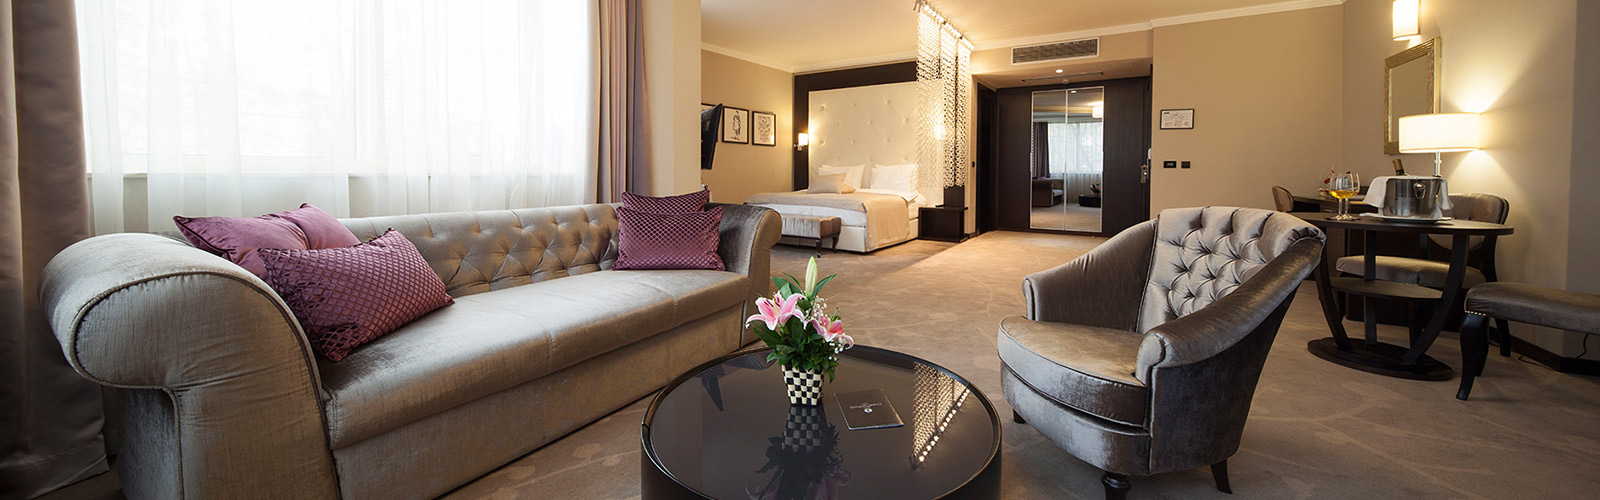 Concierge Belgrade   Hotel Constantin the great